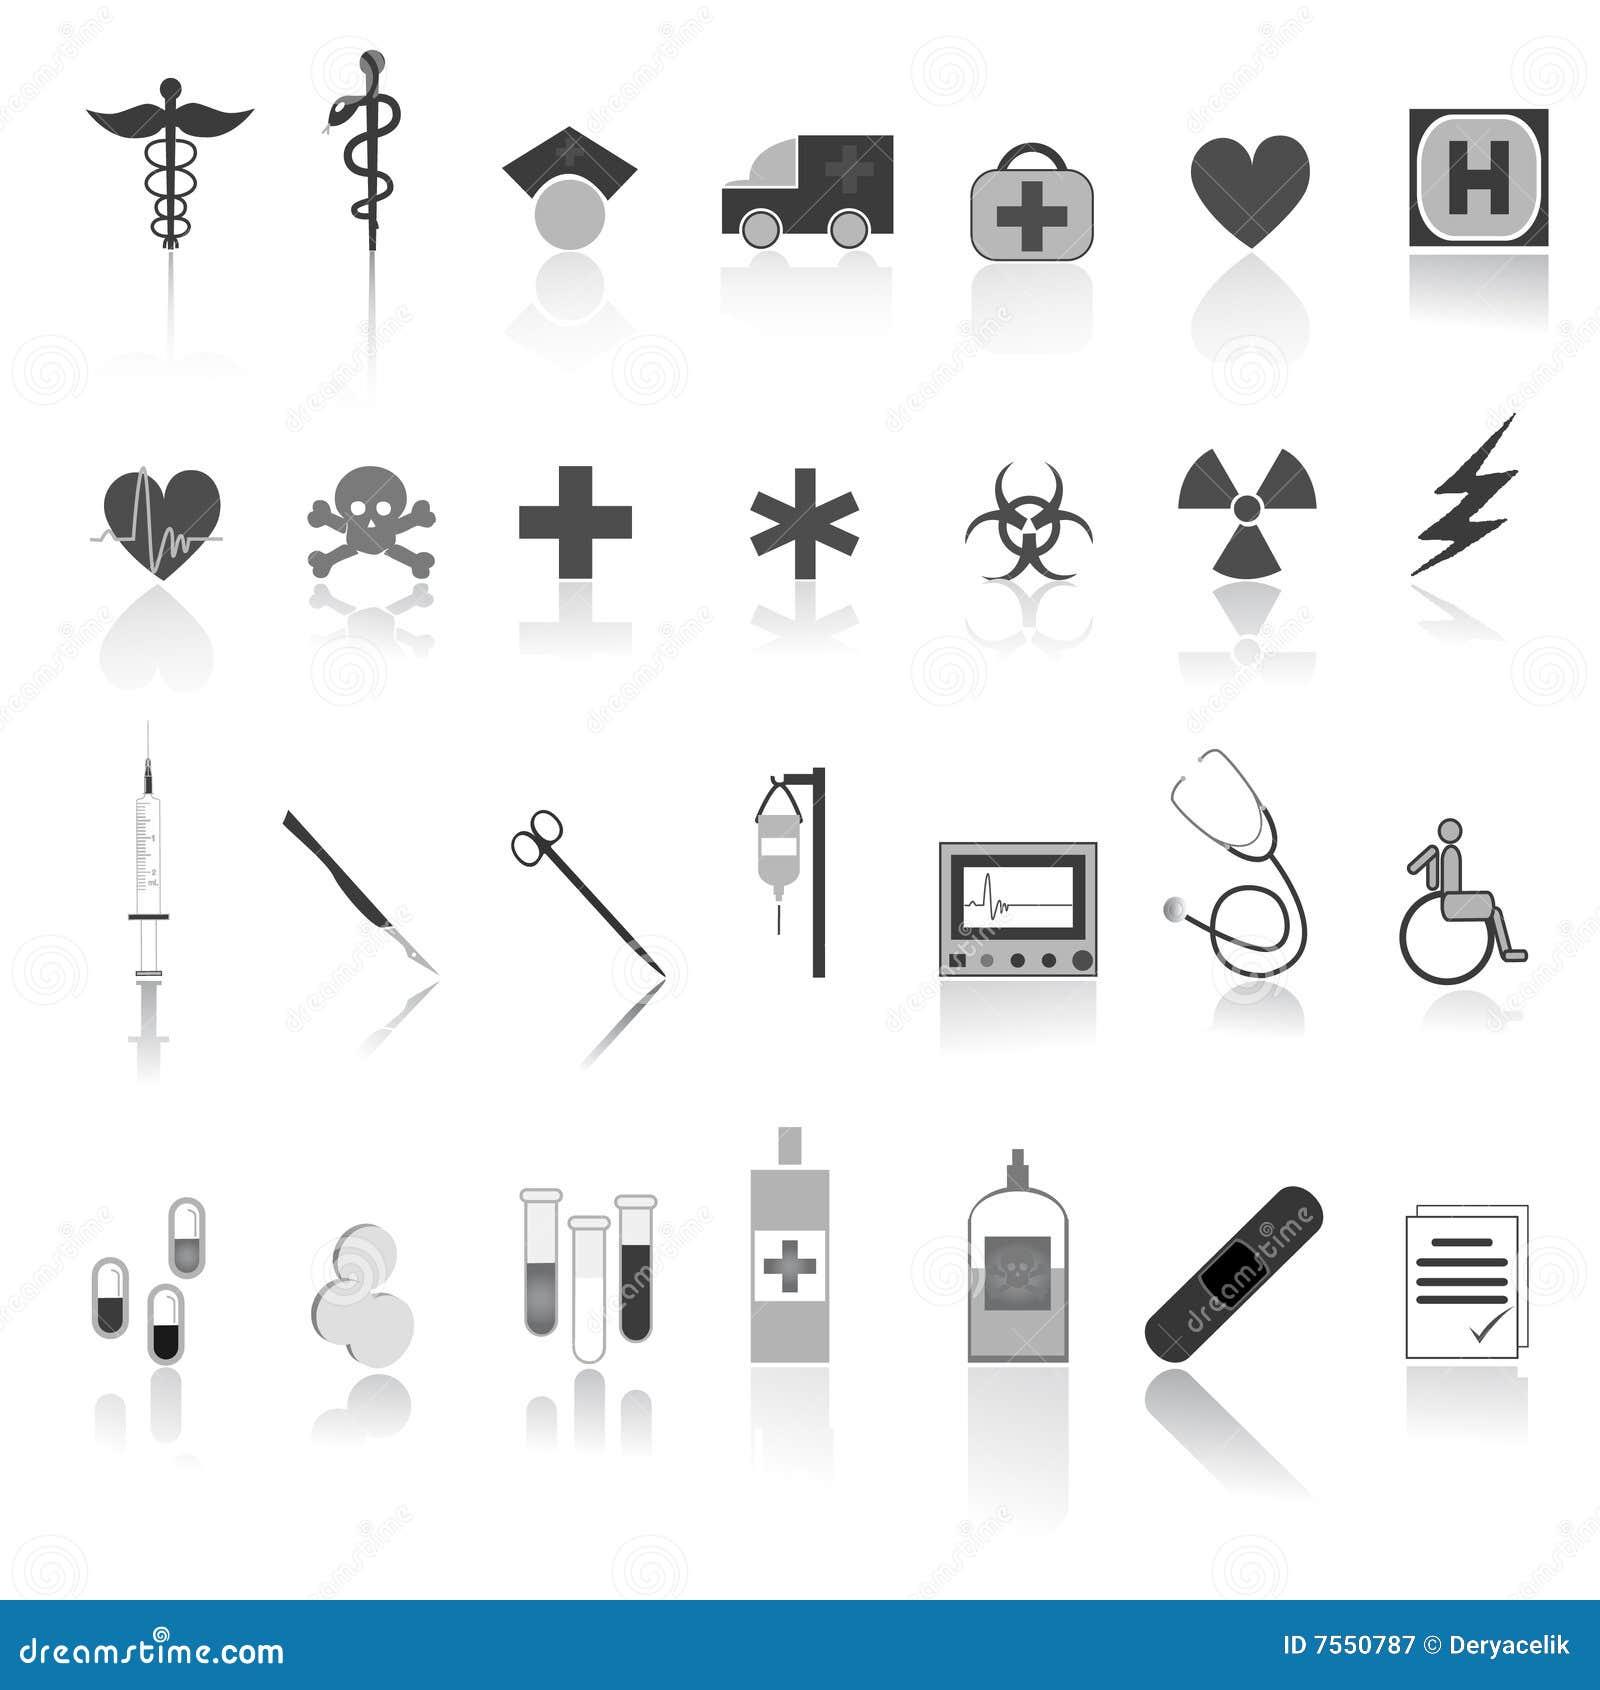 medical icon vector set royalty free stock photography Caduceus Medical Symbol Vector Editable Army Caduceus Medical Symbol